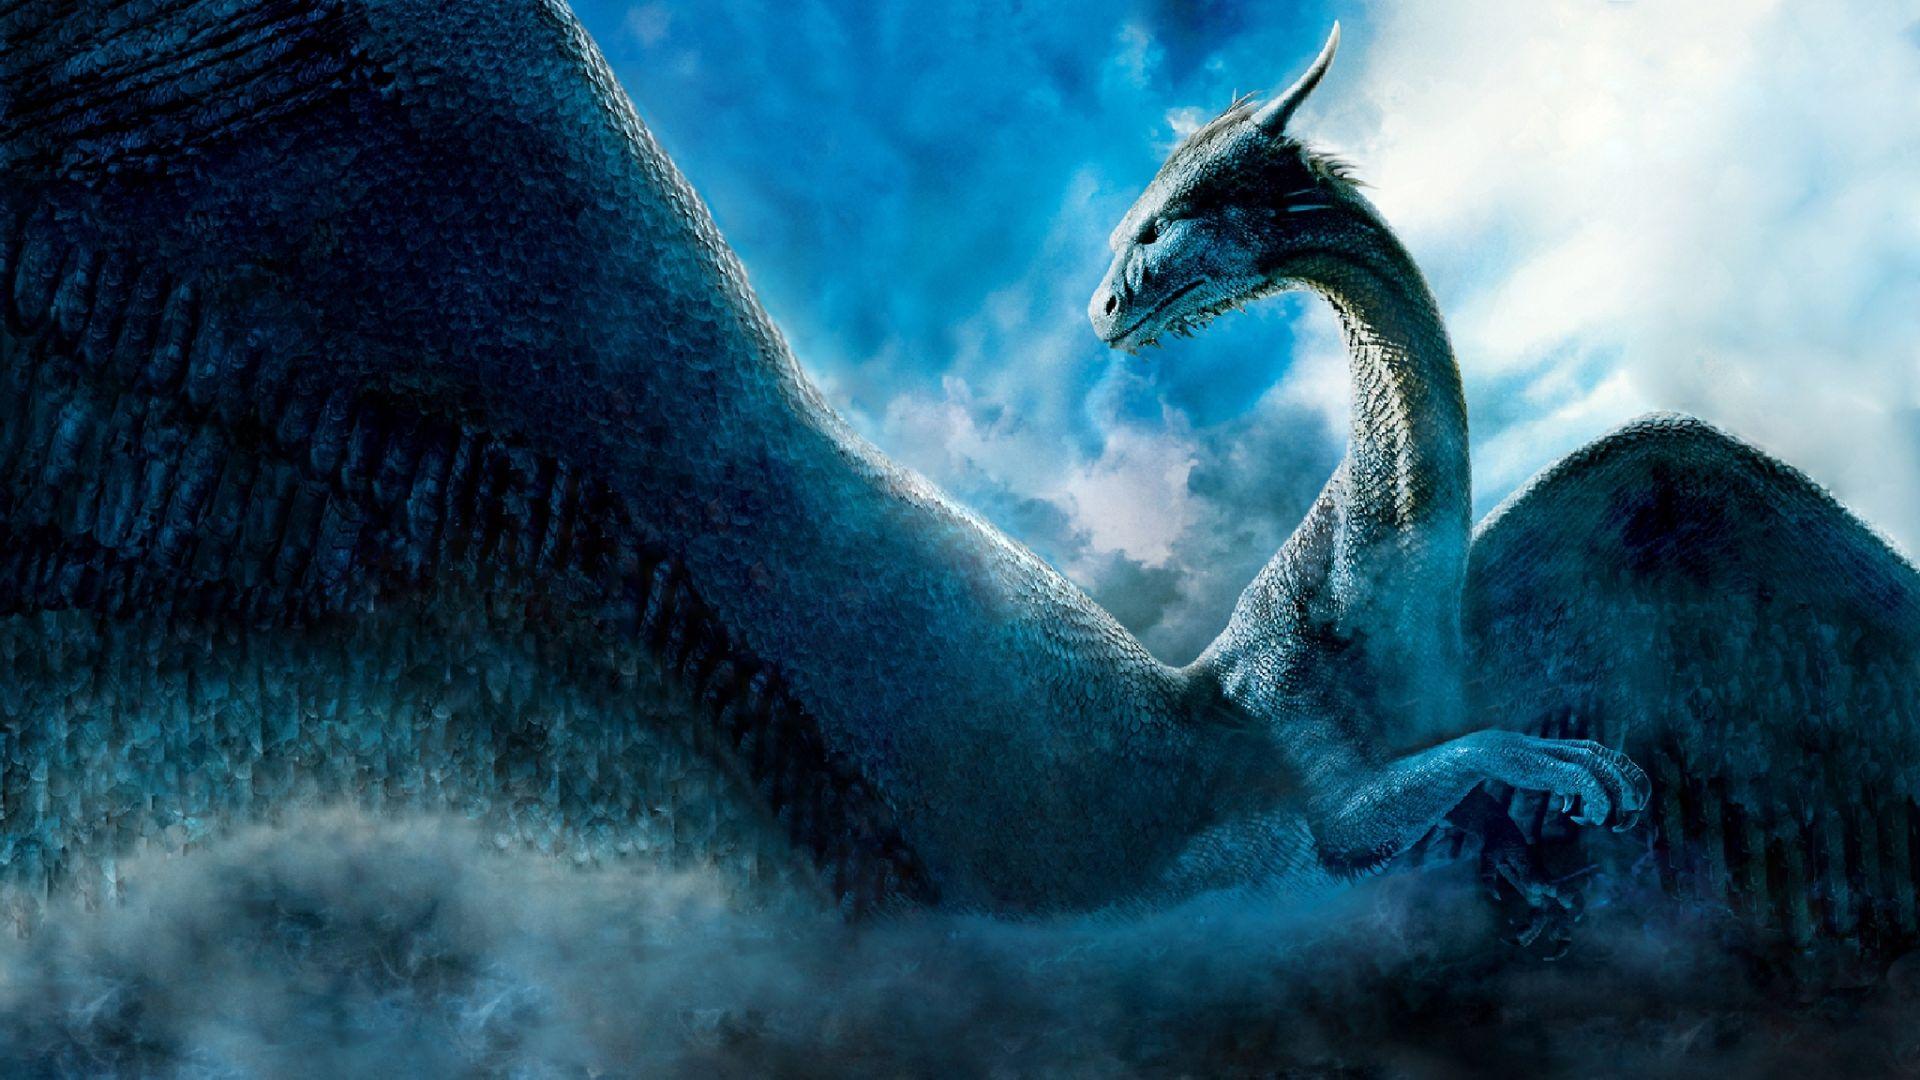 fantasy blue dragon 3d art